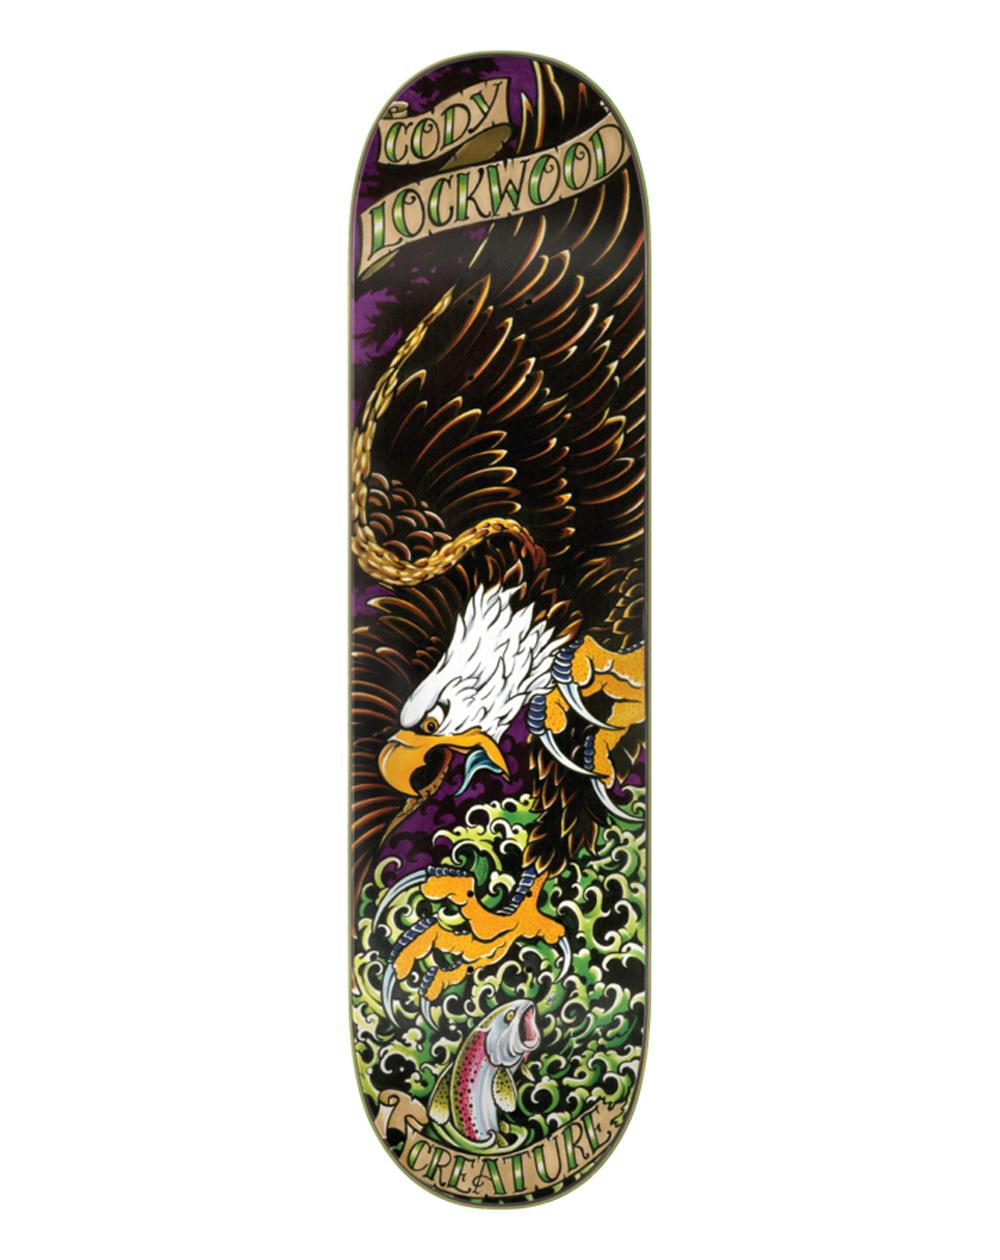 "Creature Lockwood Beast of Prey 8.25"" Skateboard Deck"